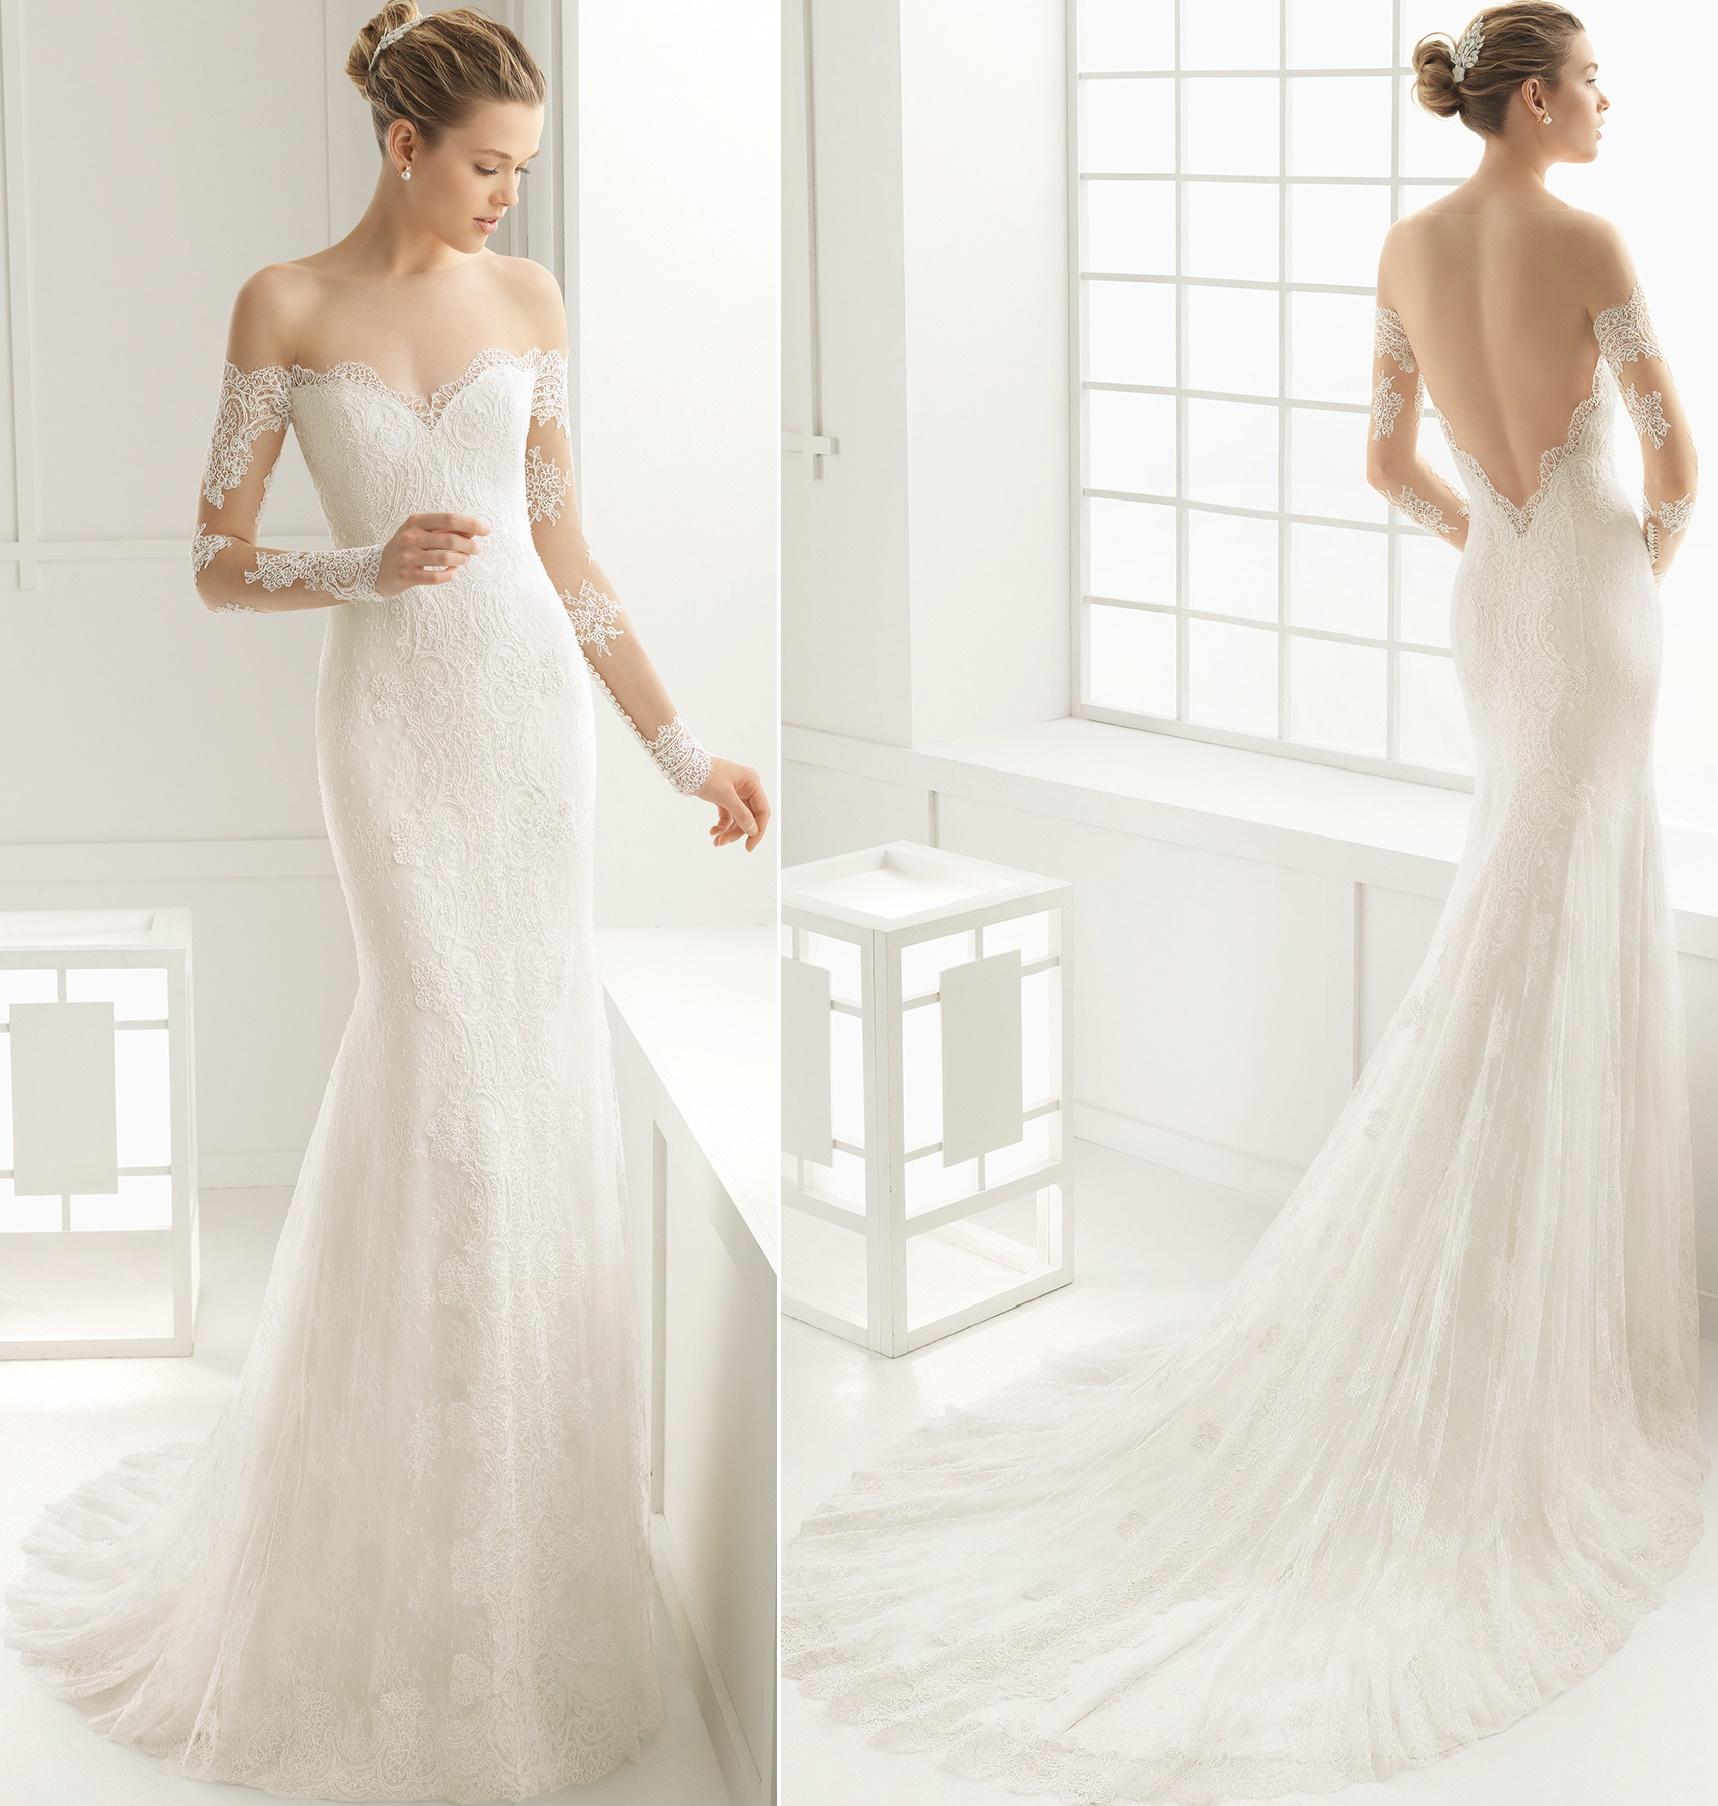 Rosa Clará13 - Vestidos de Noiva - Bridal Collection 2016